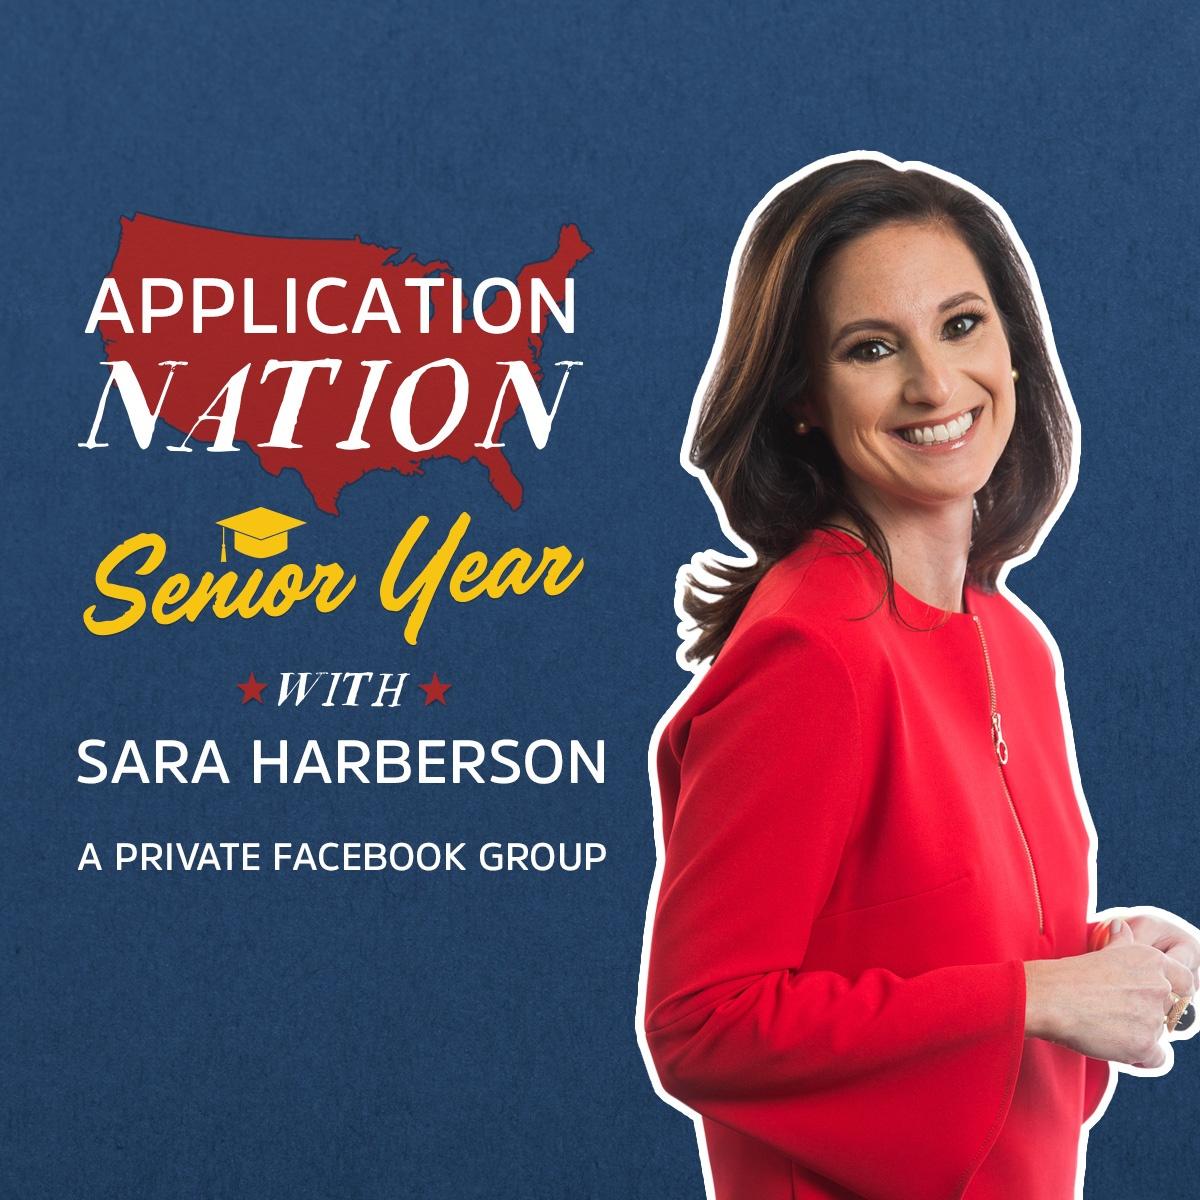 Application Nation - Senior Year